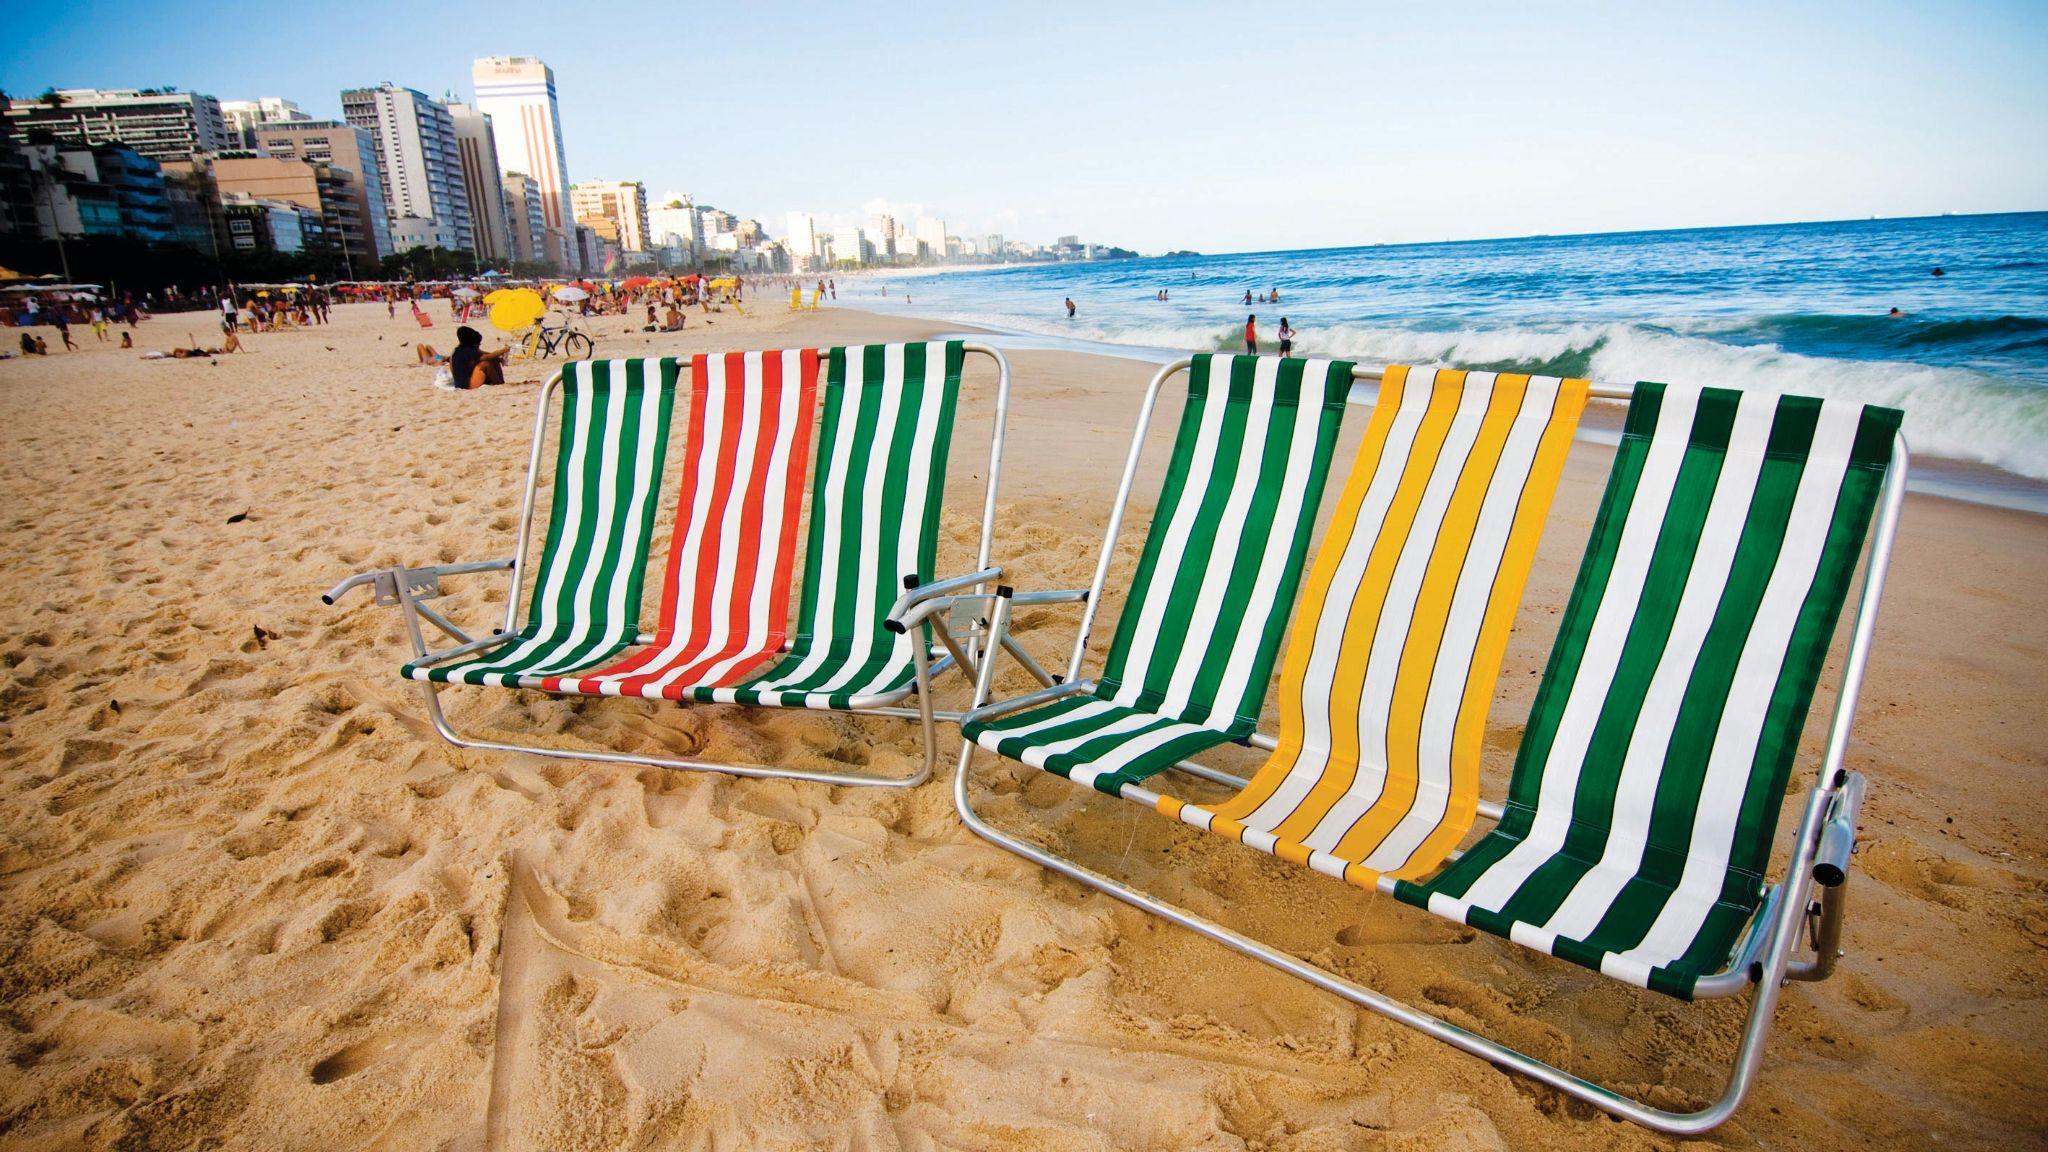 plage Copacabana transat Opavivará  Roberto Cabot Stream 03  PCA-Stream